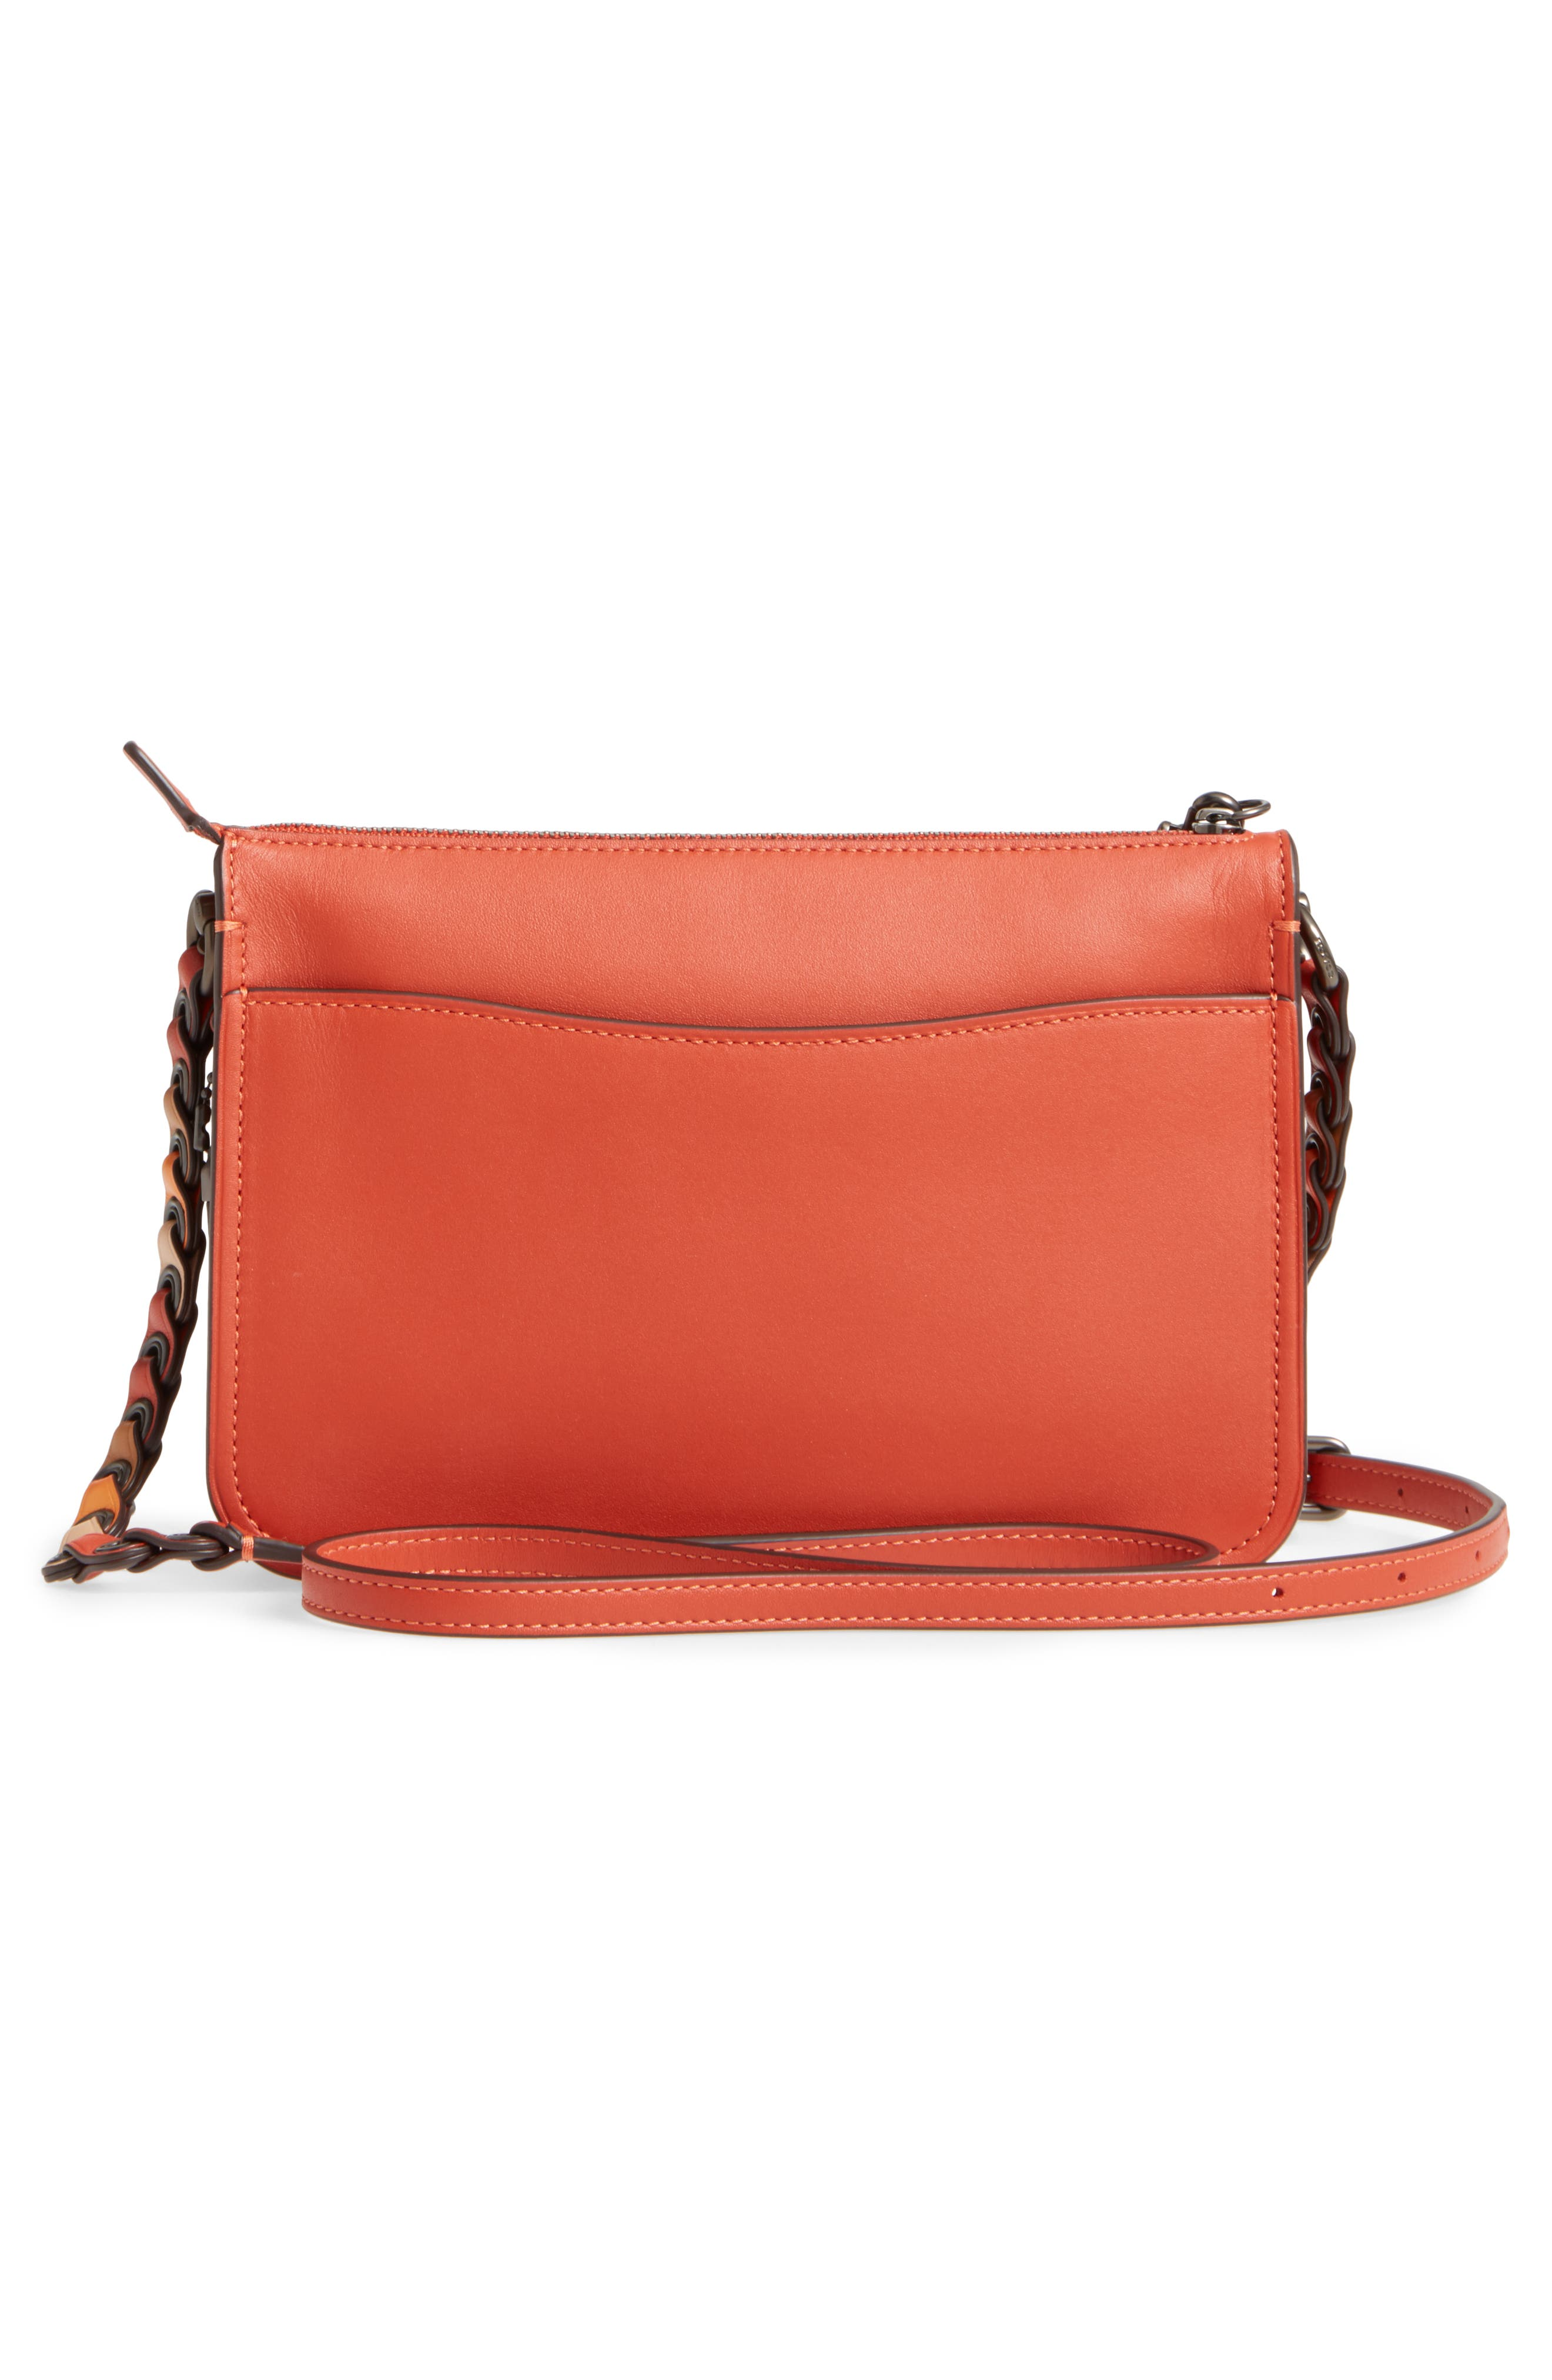 Soho Leather Crossbody Bag,                             Alternate thumbnail 3, color,                             Vermillion